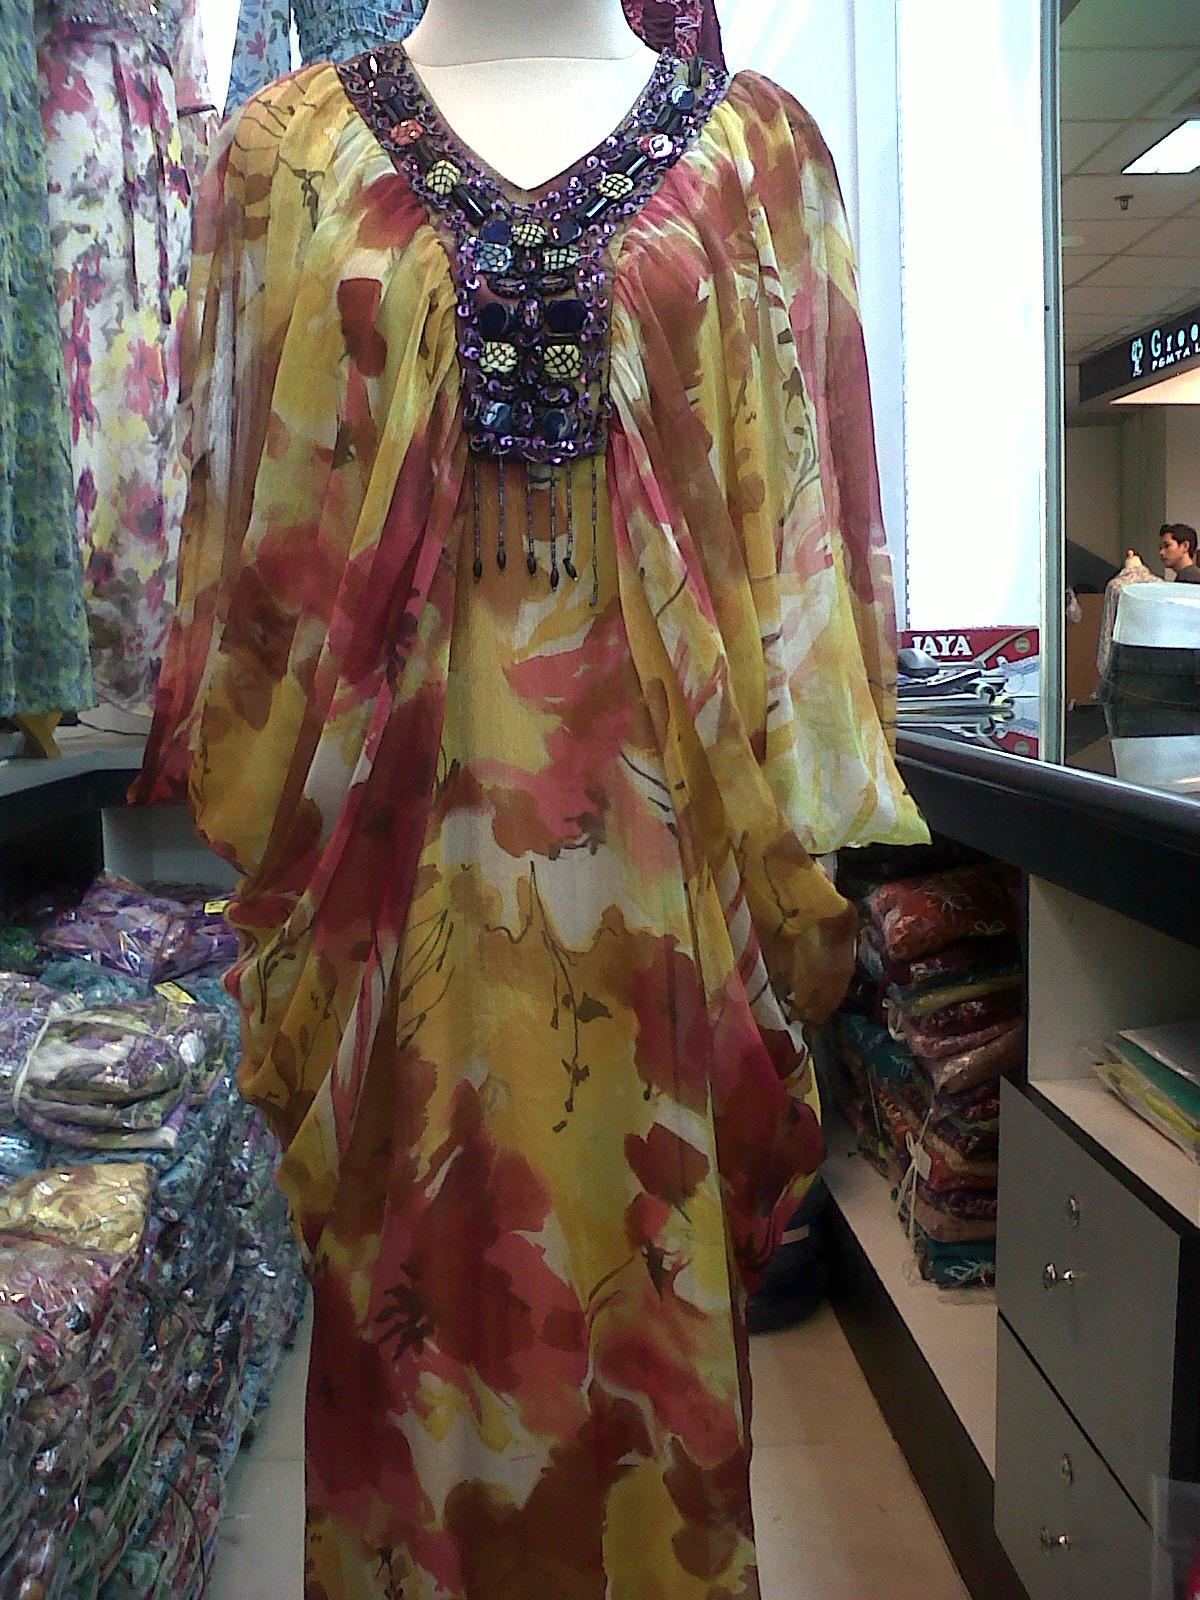 Gaya Busana Koleksi Fashion Gamis Gaun Syahrini Motif